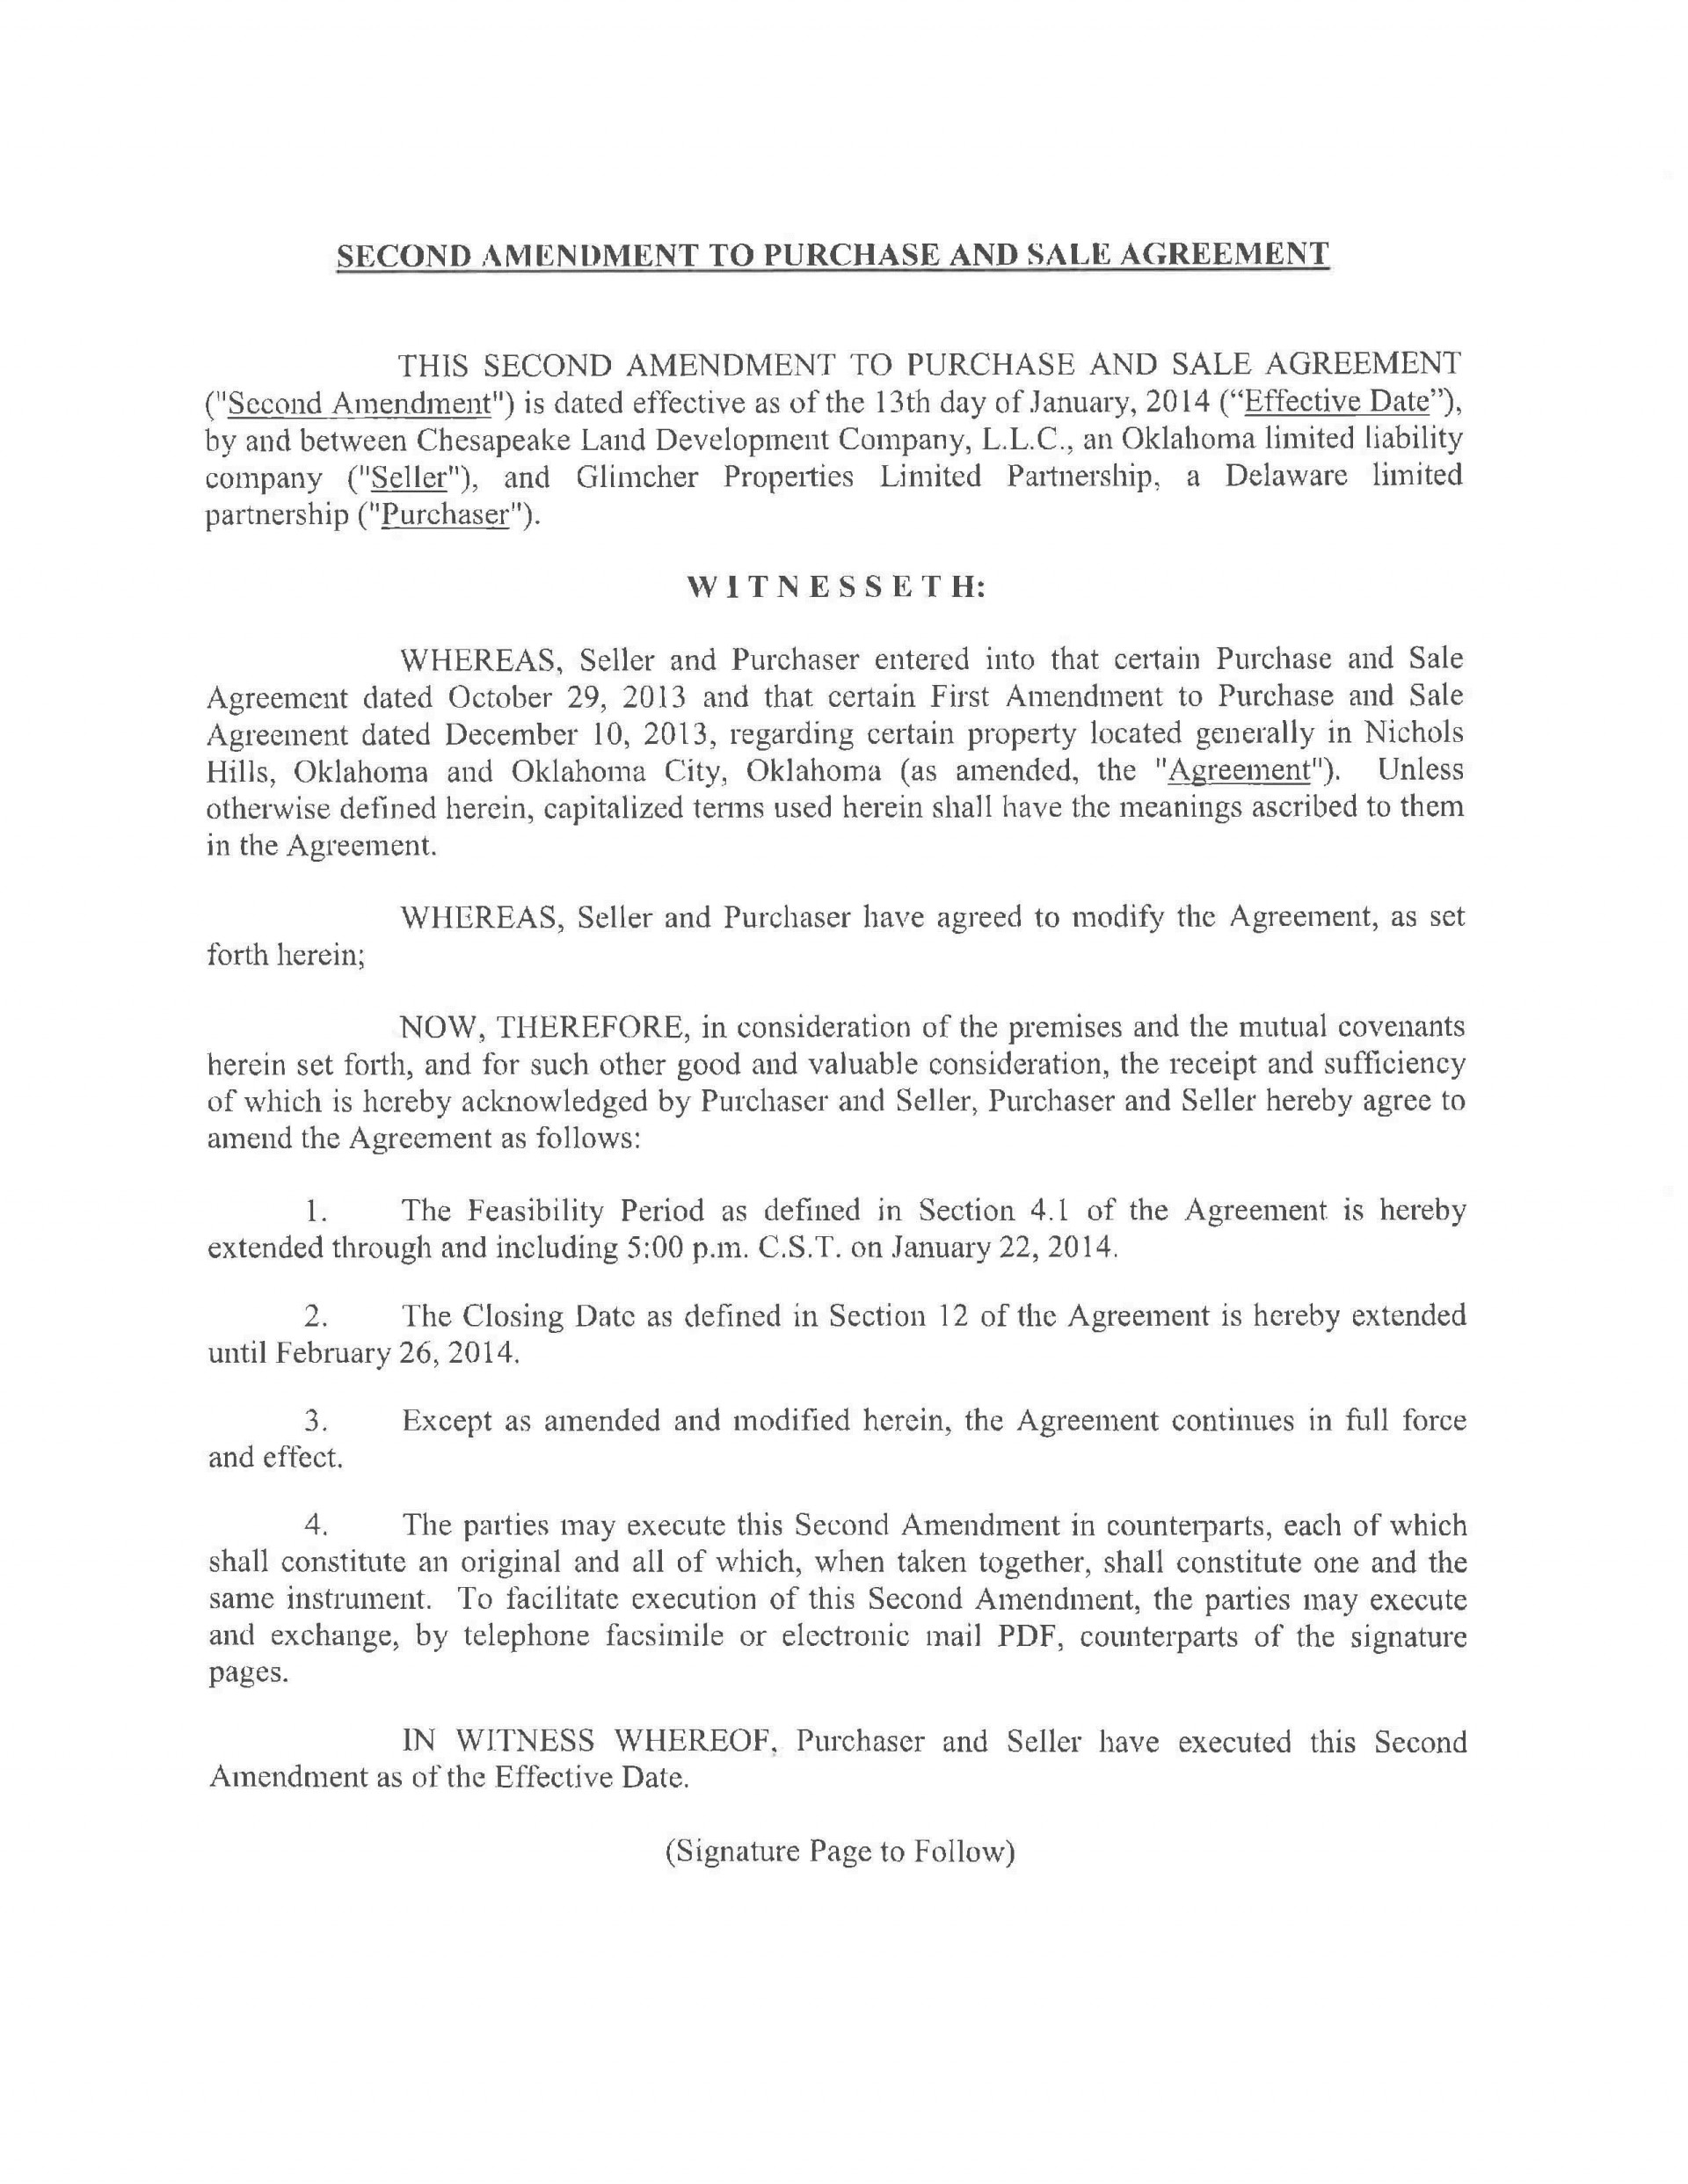 007 Stupendou Buy Sell Agreement Llc Sample Example 1920